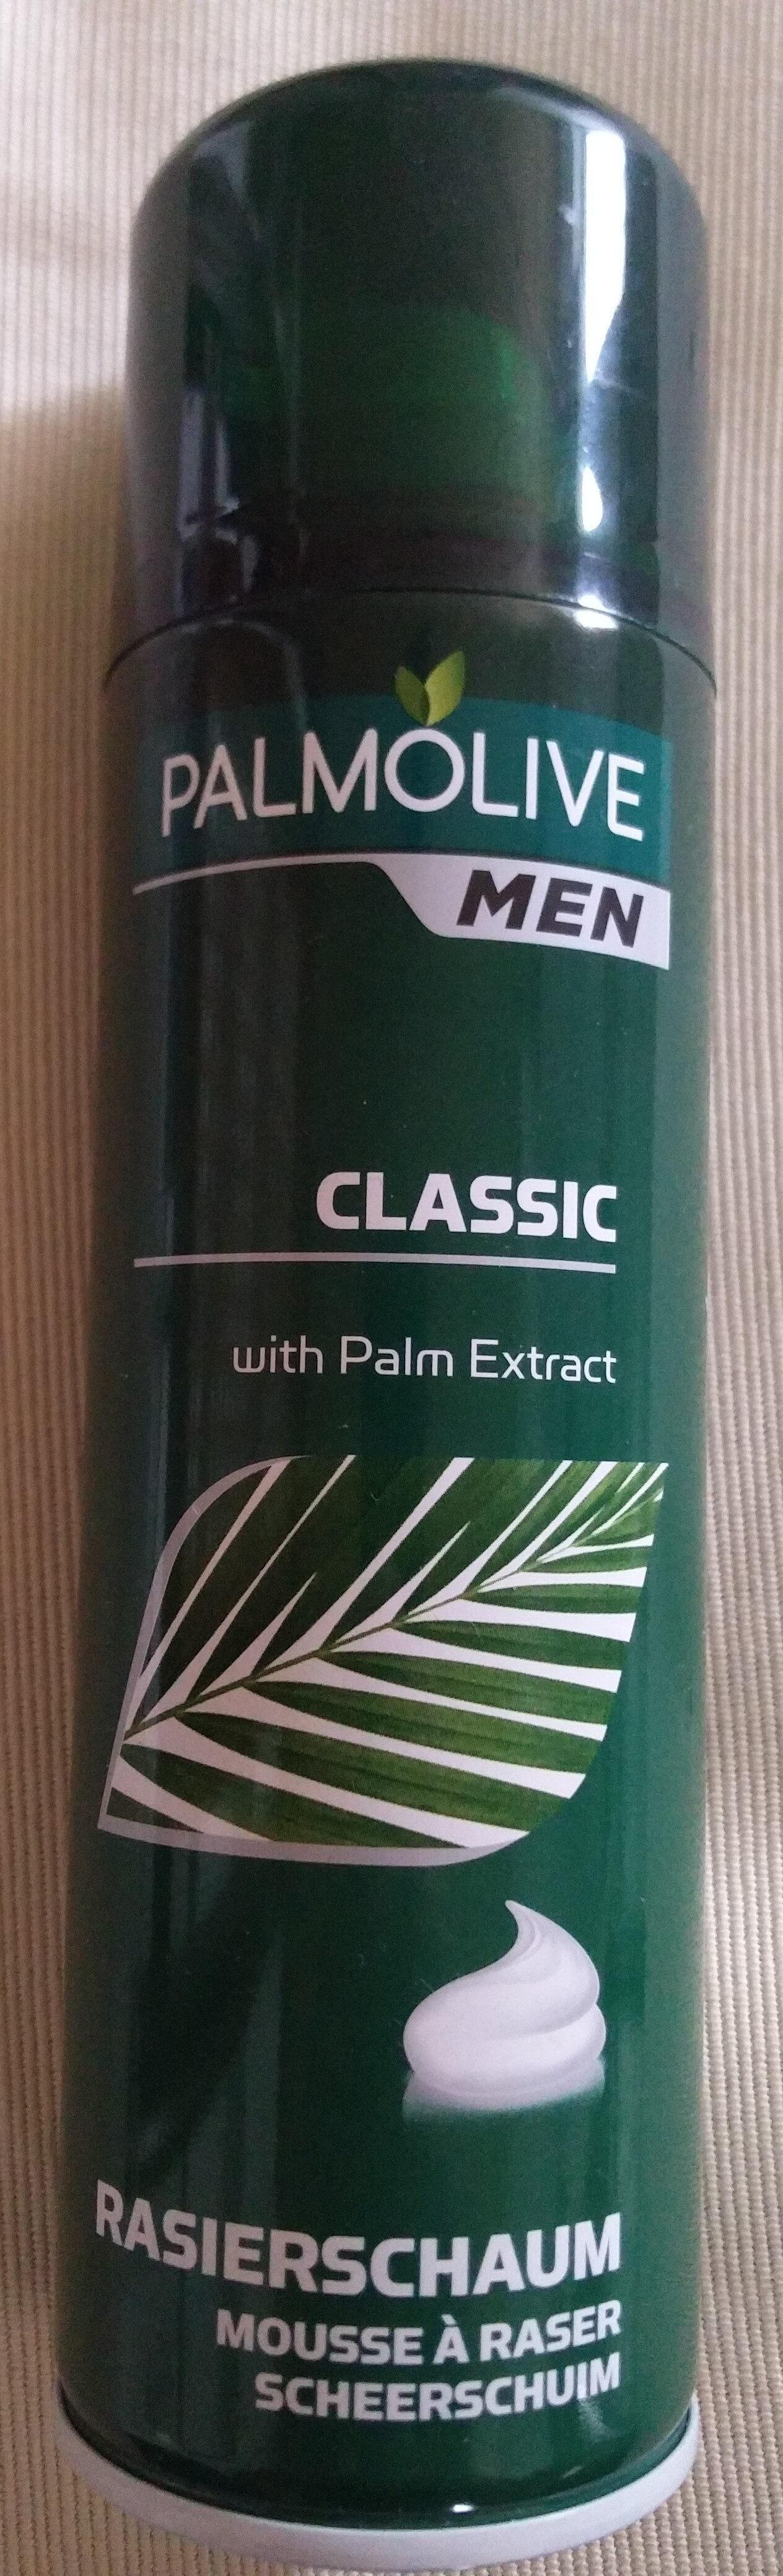 Rasierschaum Classic (with Palm Extract) - Продукт - de